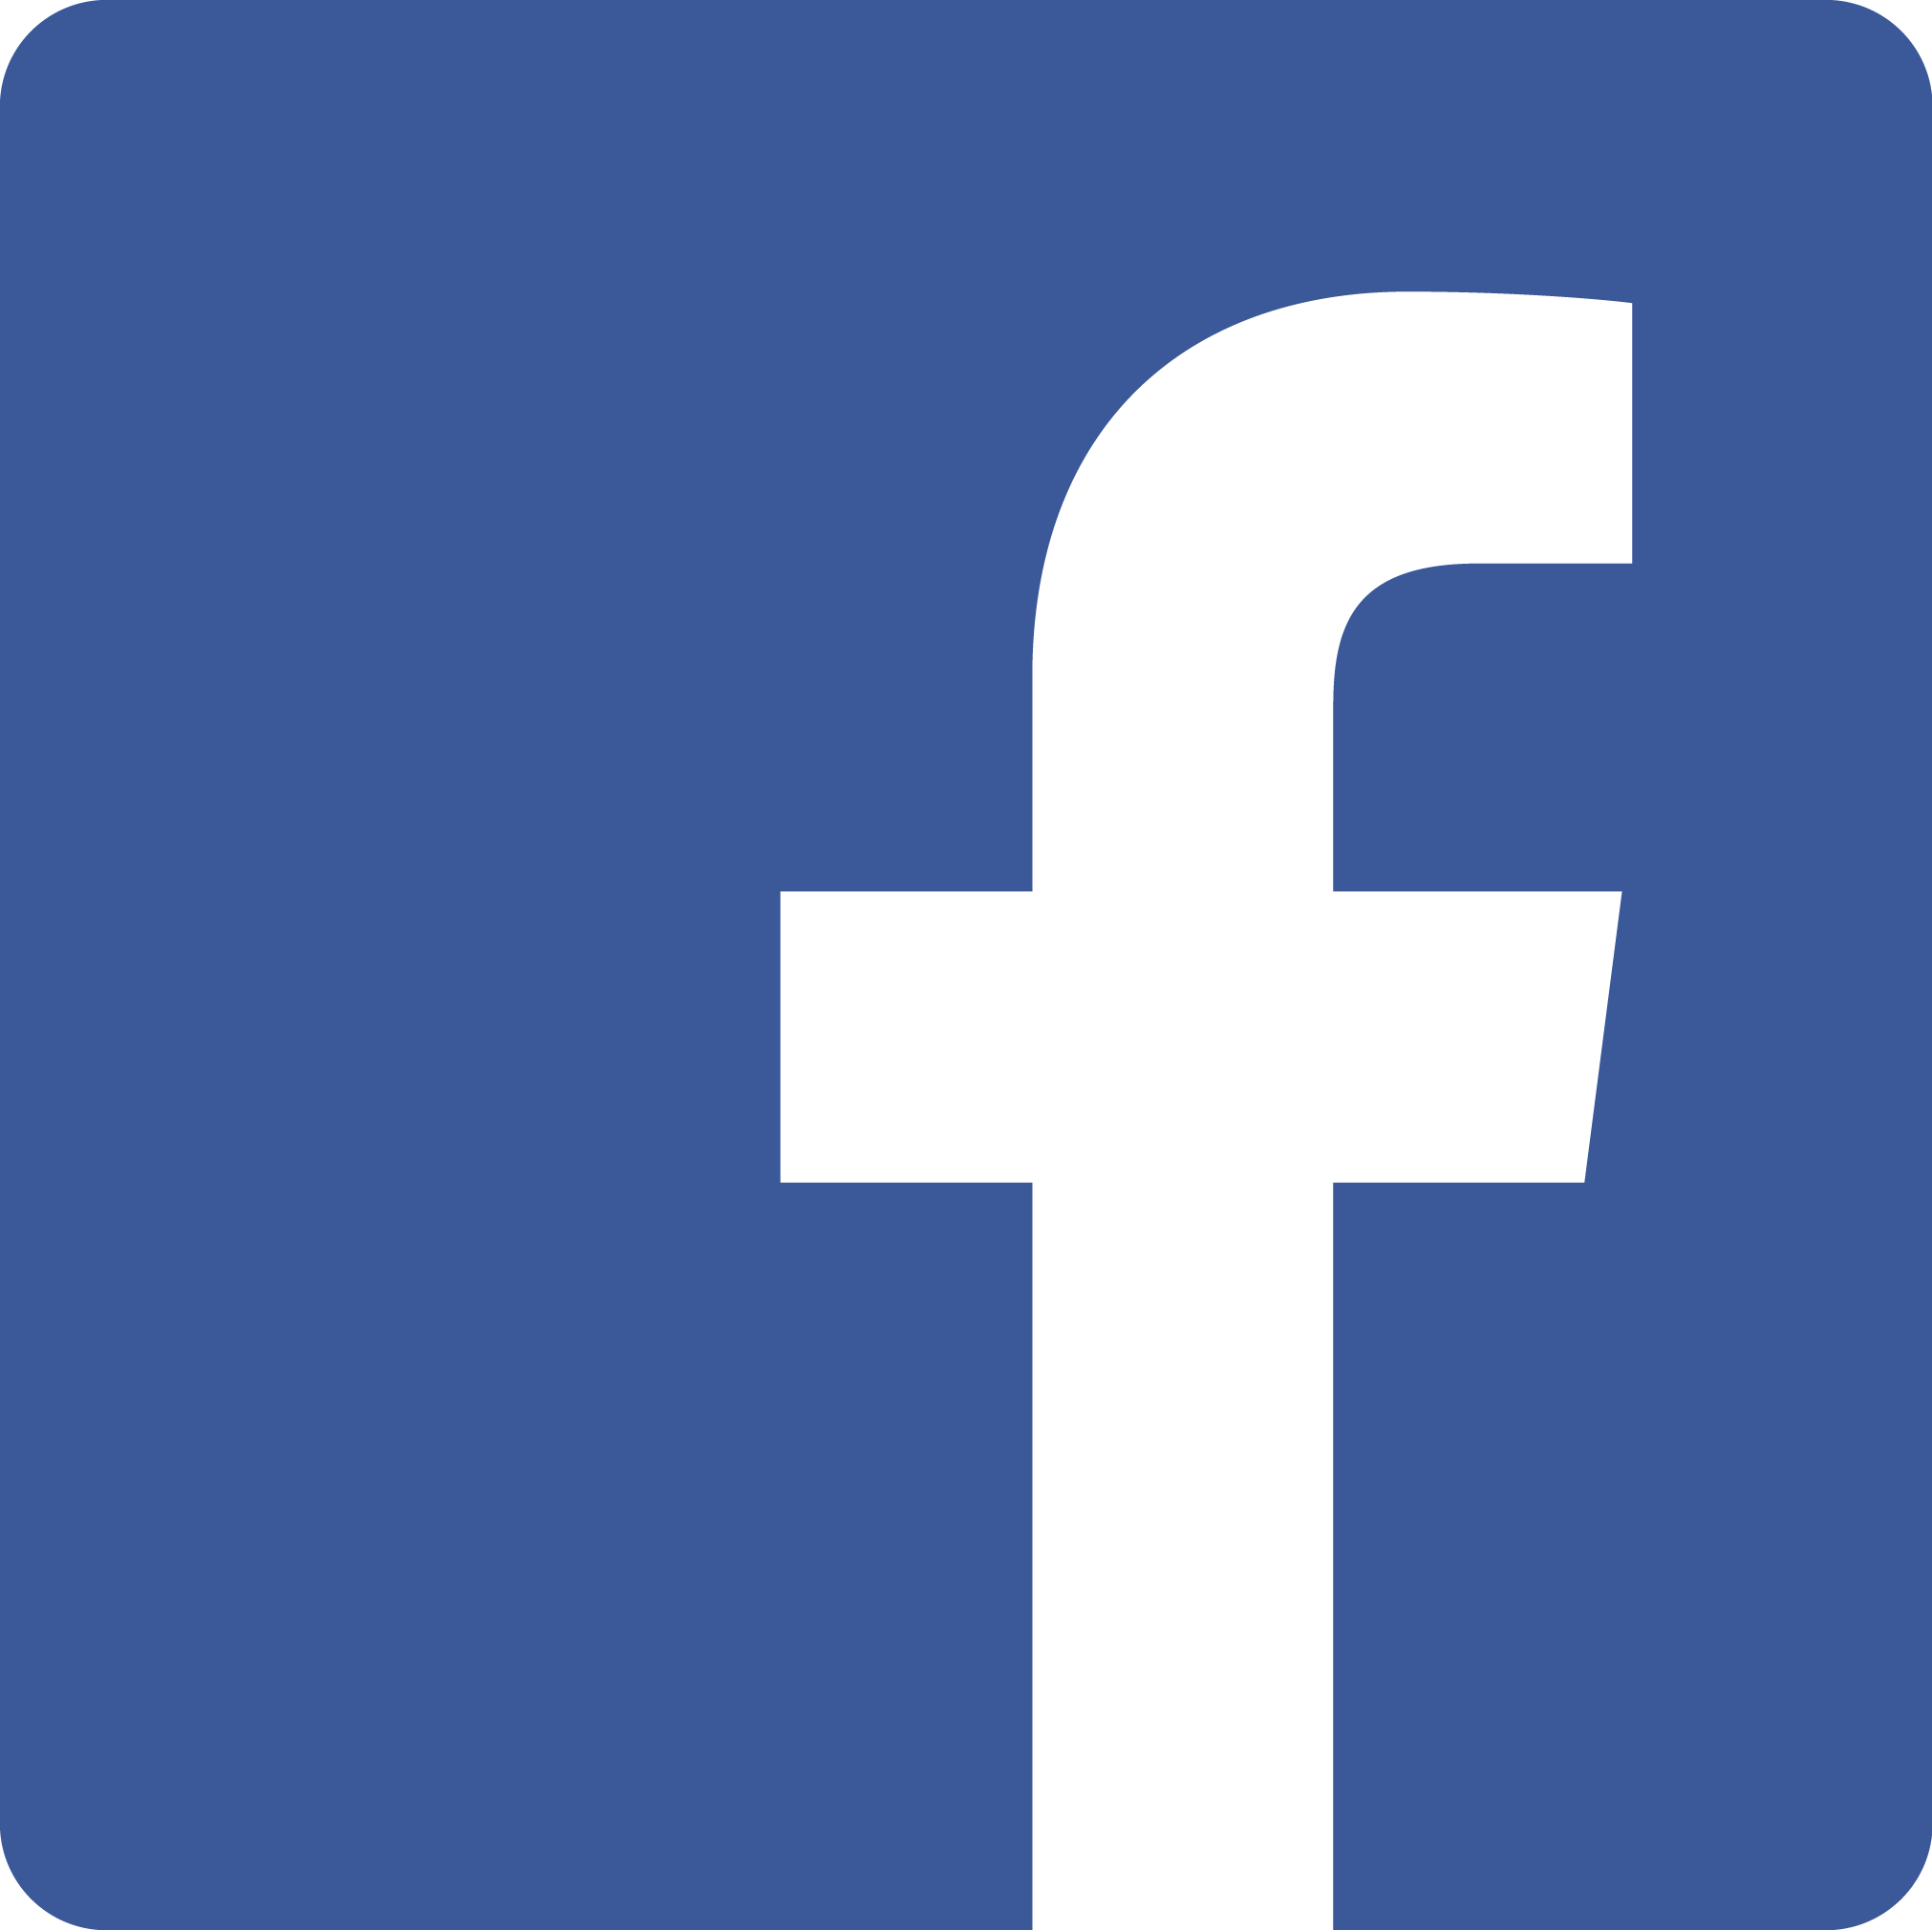 Facebook thumbnail clipart vector freeuse library 14 cliparts for free. Download Facebook clipart thumbnail and use in ... vector freeuse library